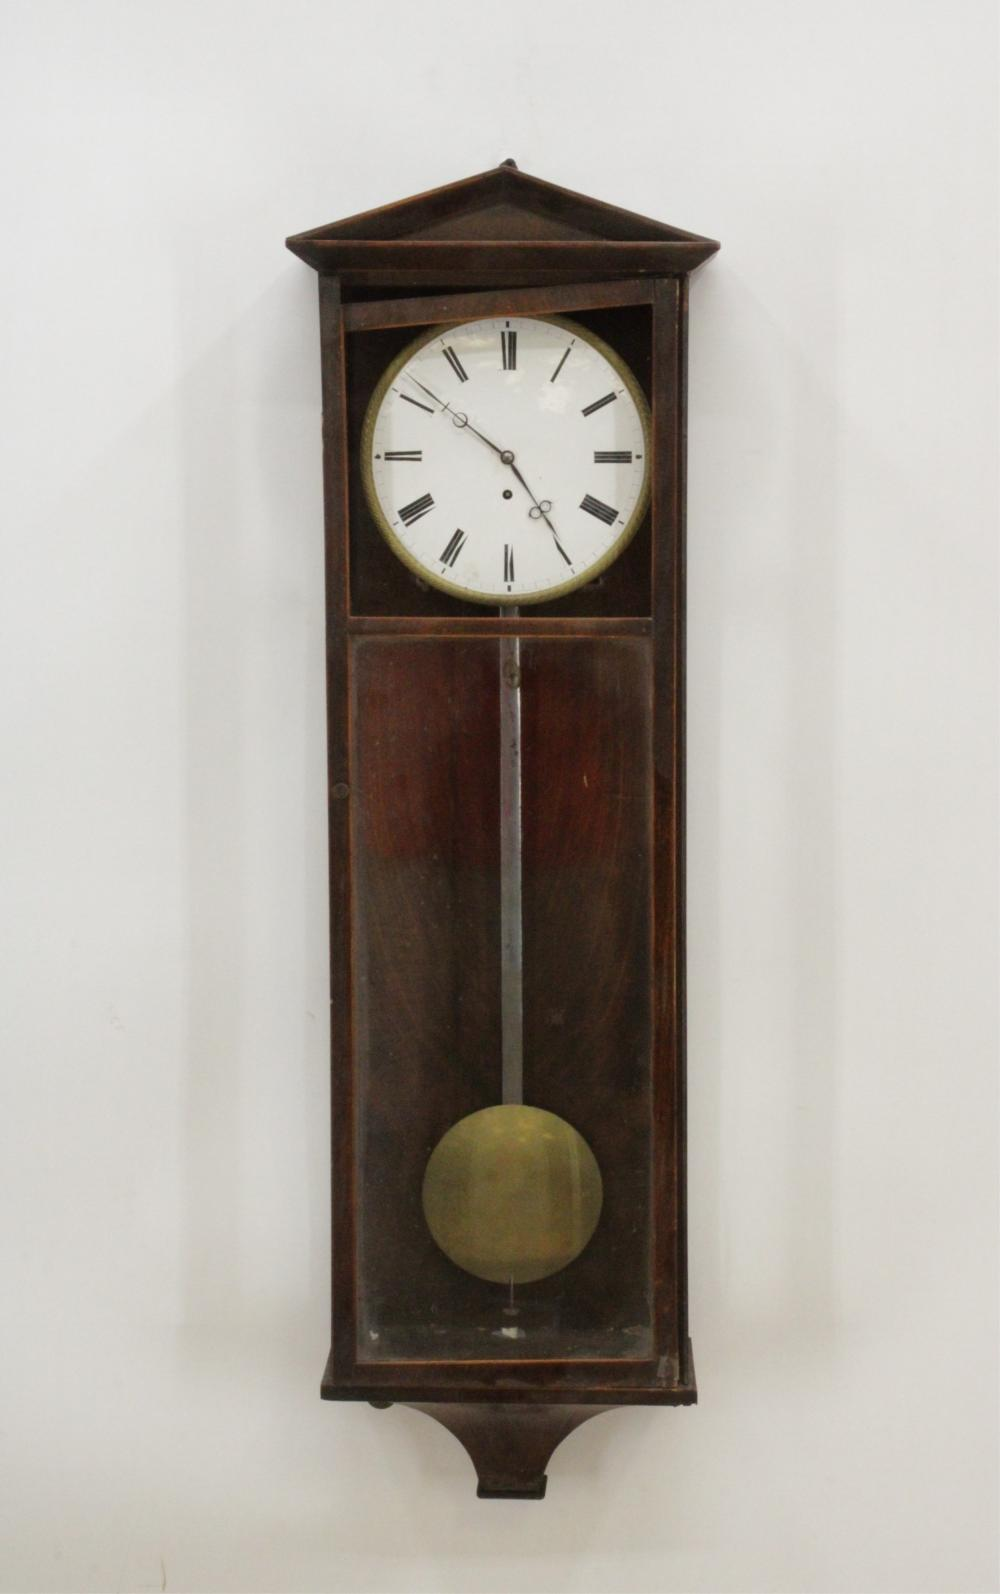 VICTORIAN INLAID MAHOGANY REGULATOR CLOCK, 19TH C.